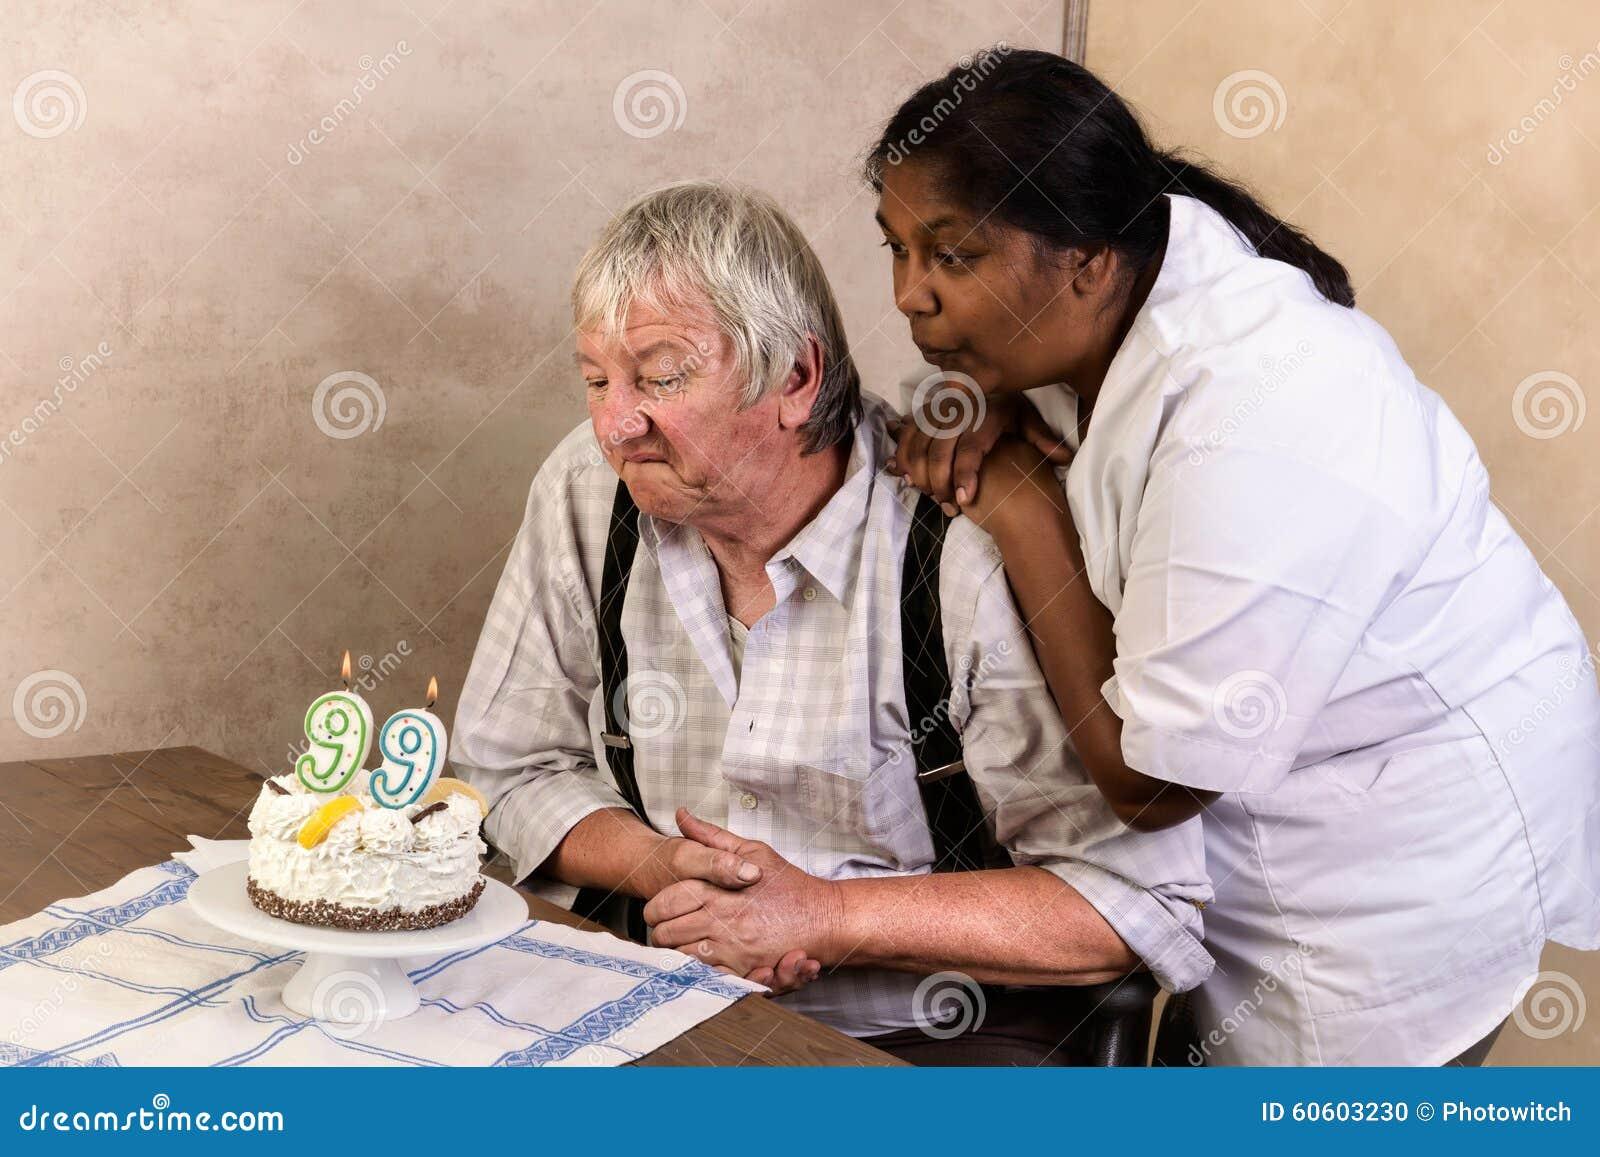 old man with birthday cake stock photo image of grey